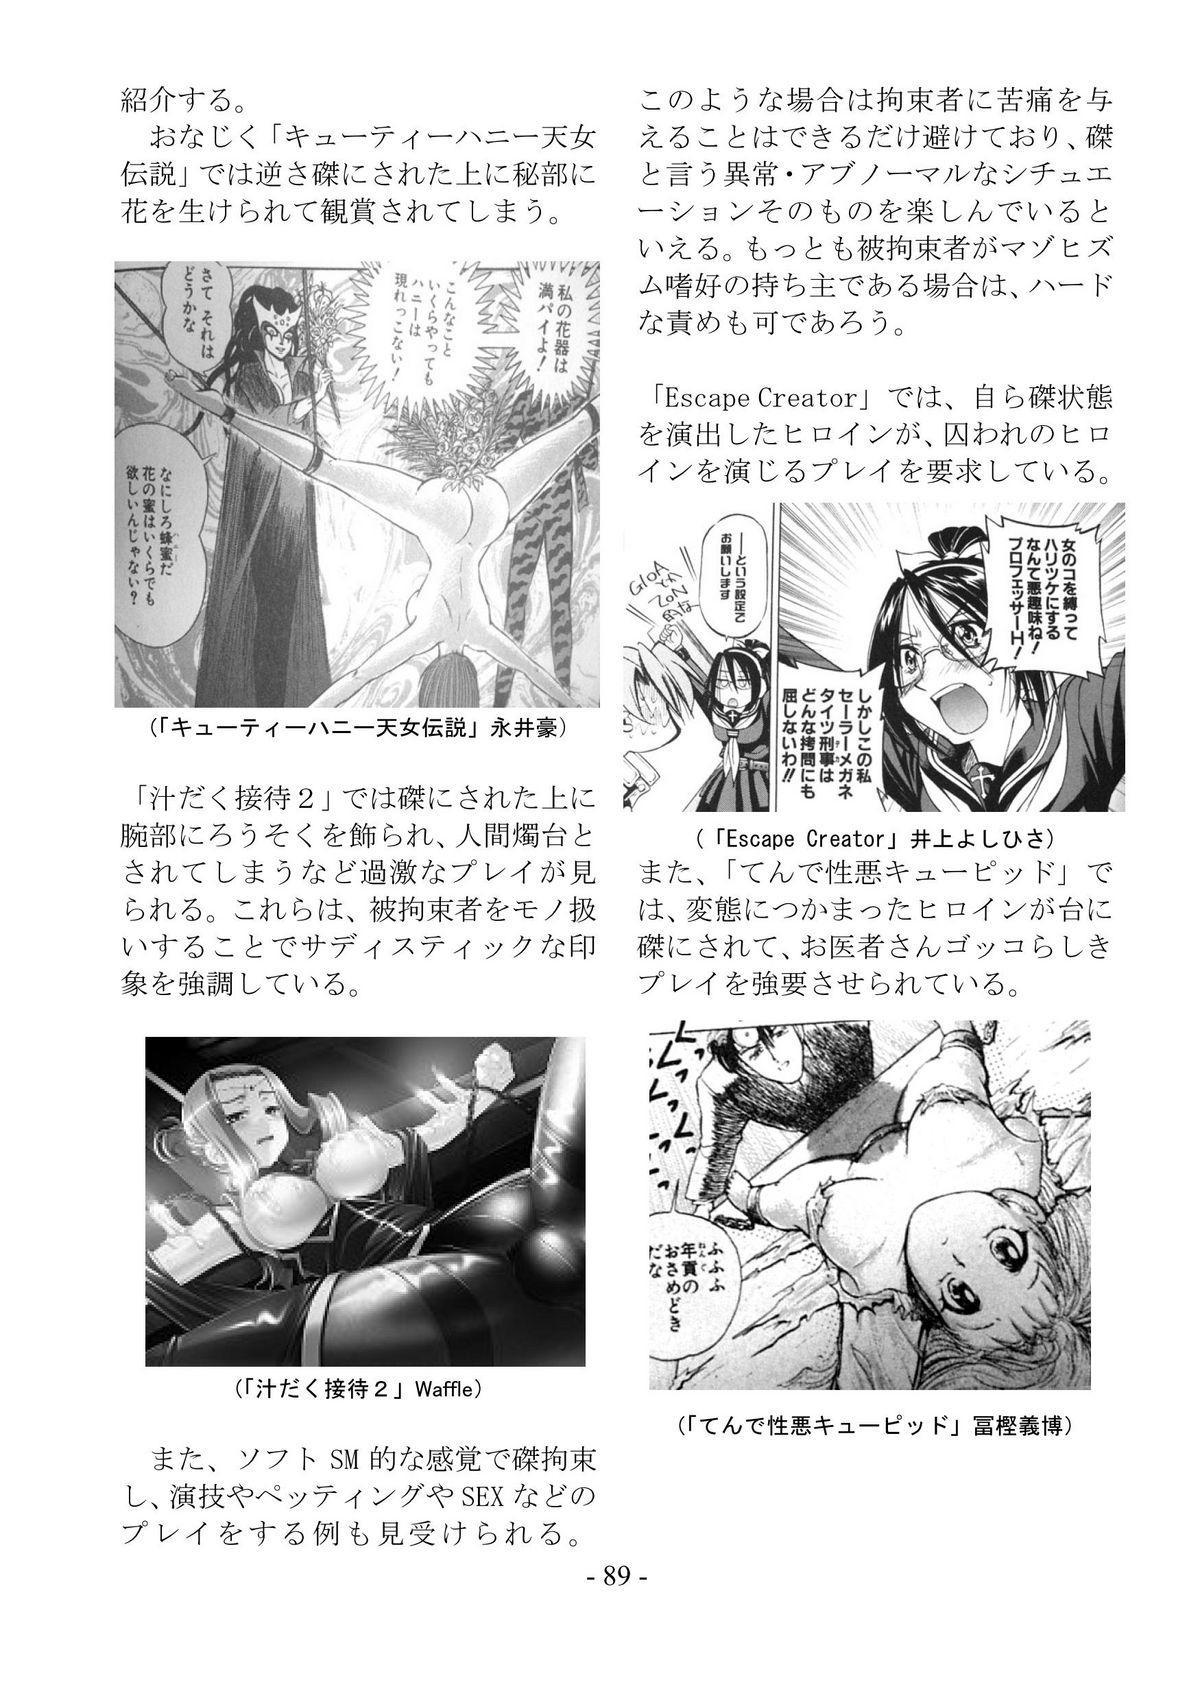 encyclopedia of crucifixion 89